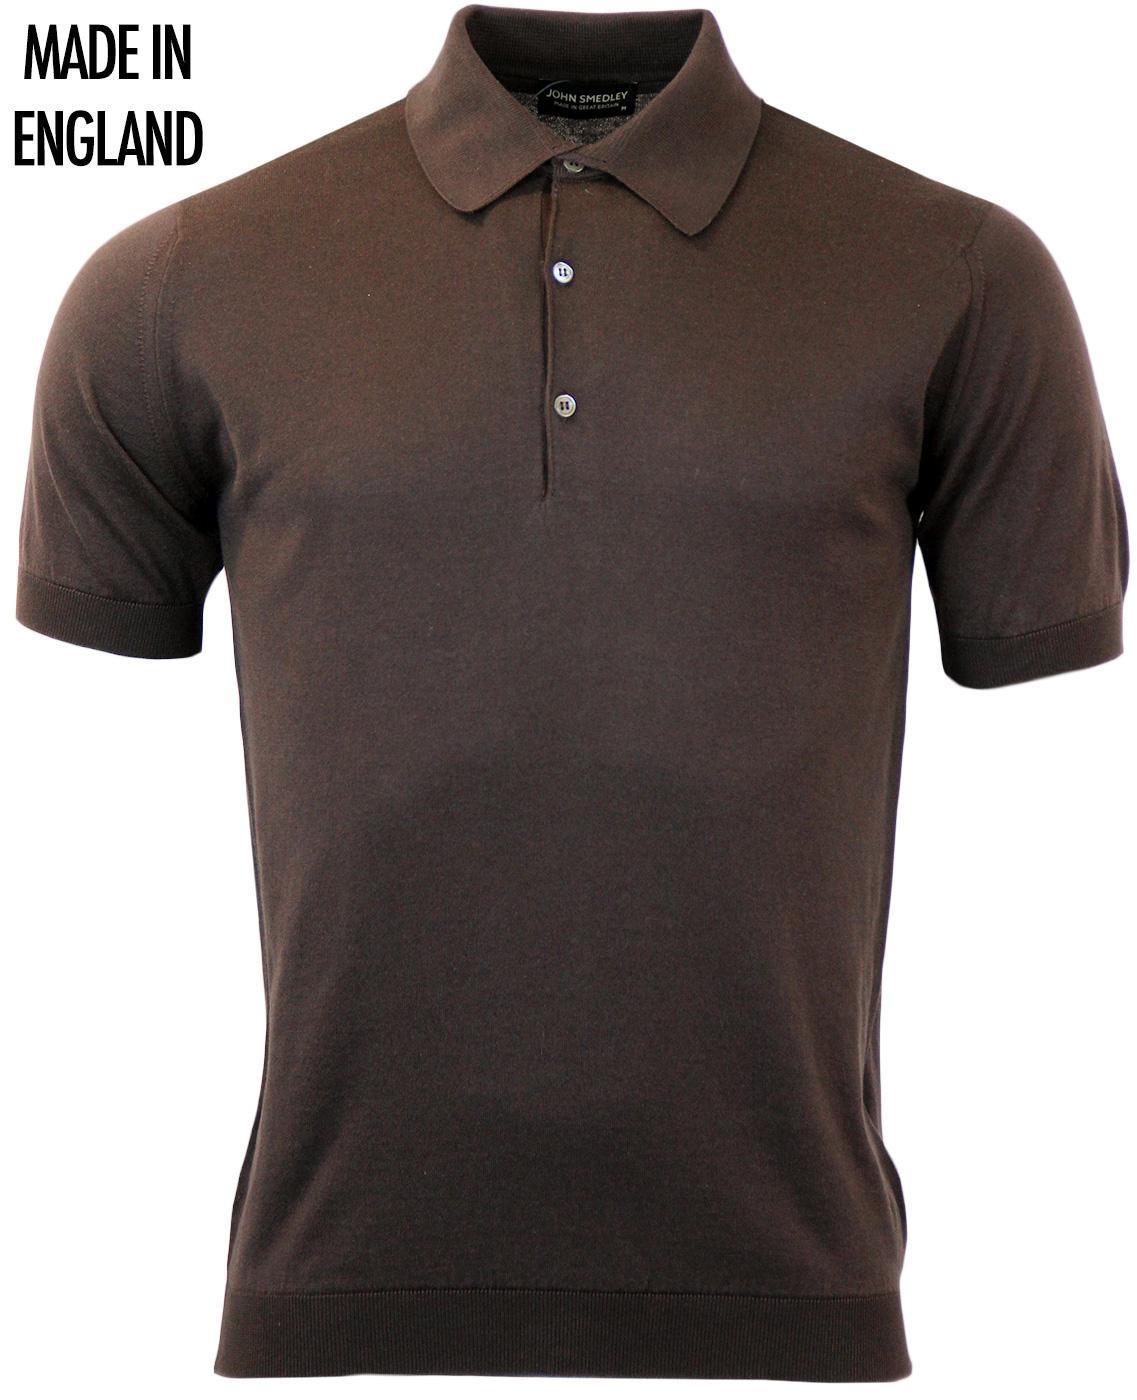 Adrian JOHN SMEDLEY Mens Mod Knitted Polo Shirt DL